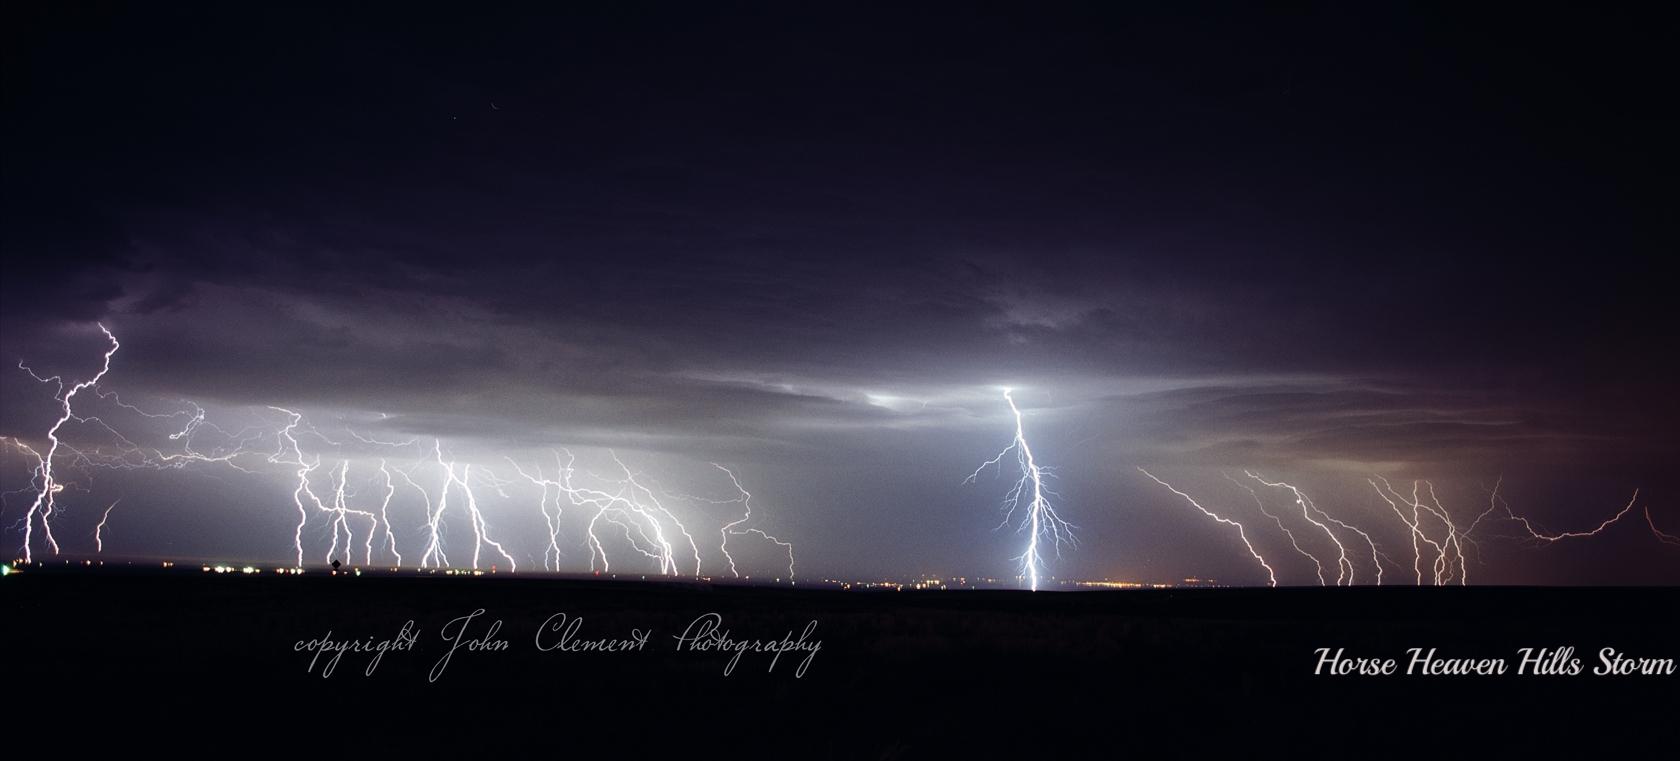 hhhilstorm-52.jpg